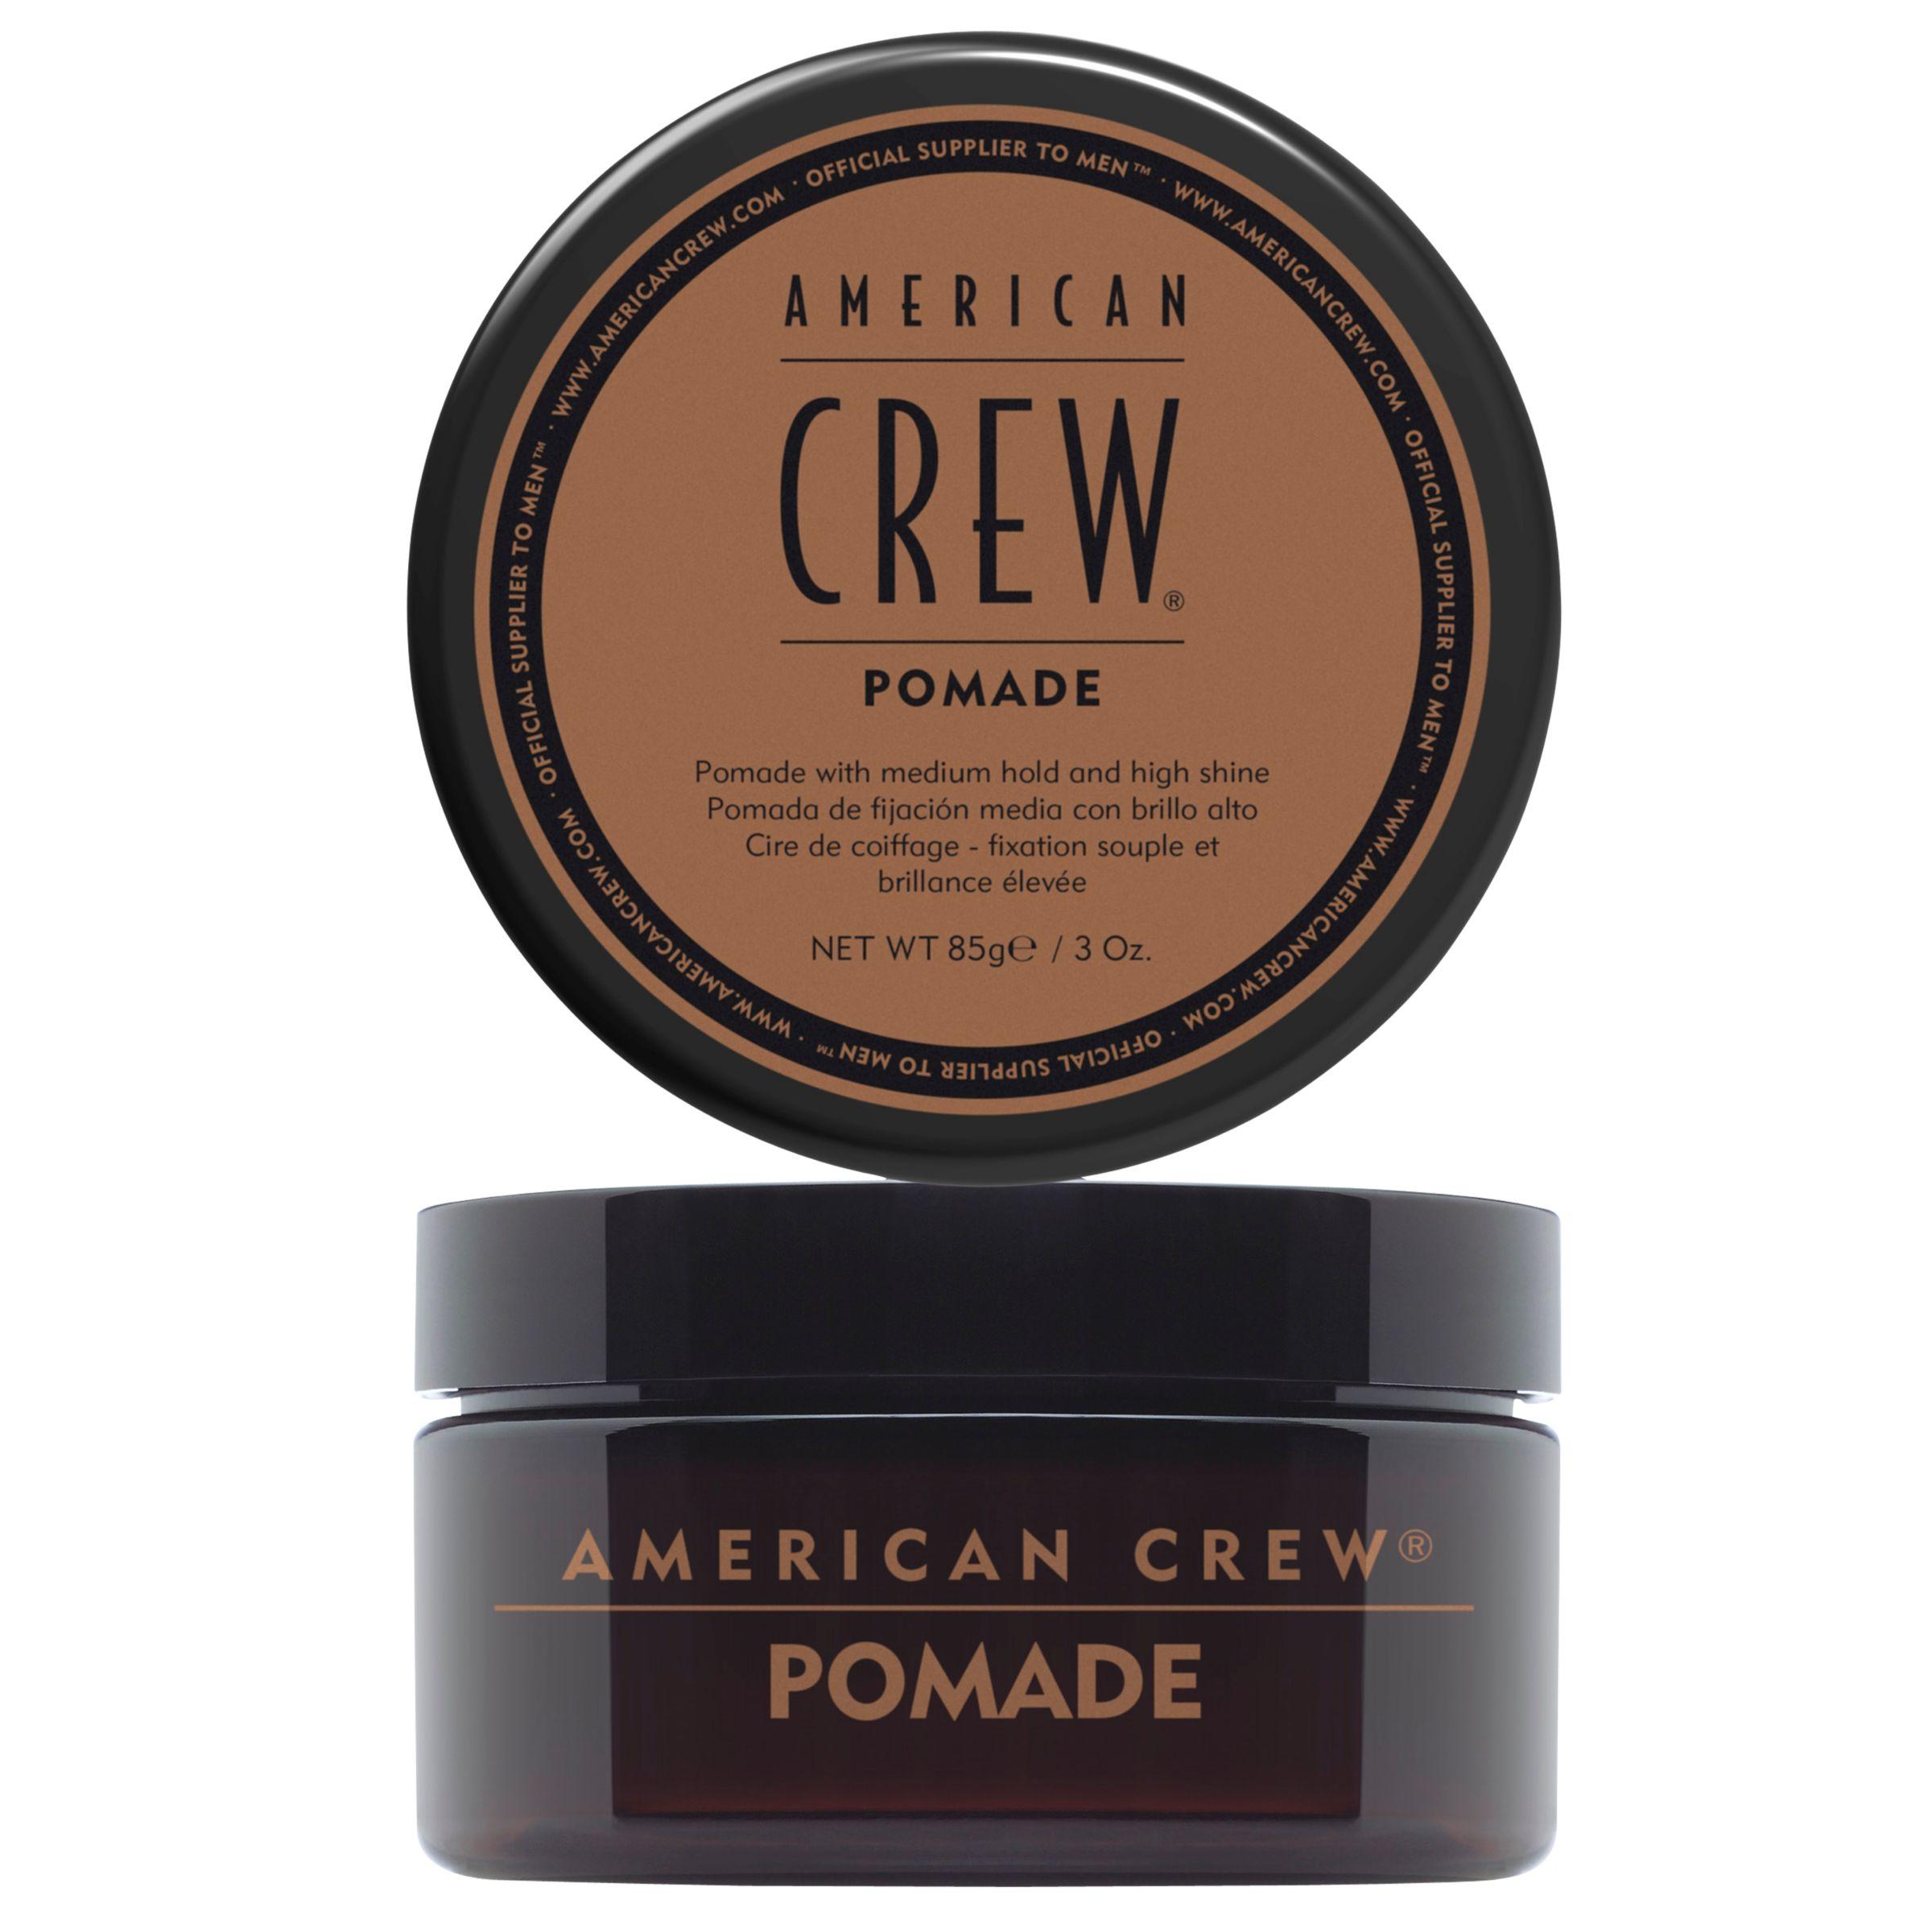 American Crew American Crew Pomade, 85g